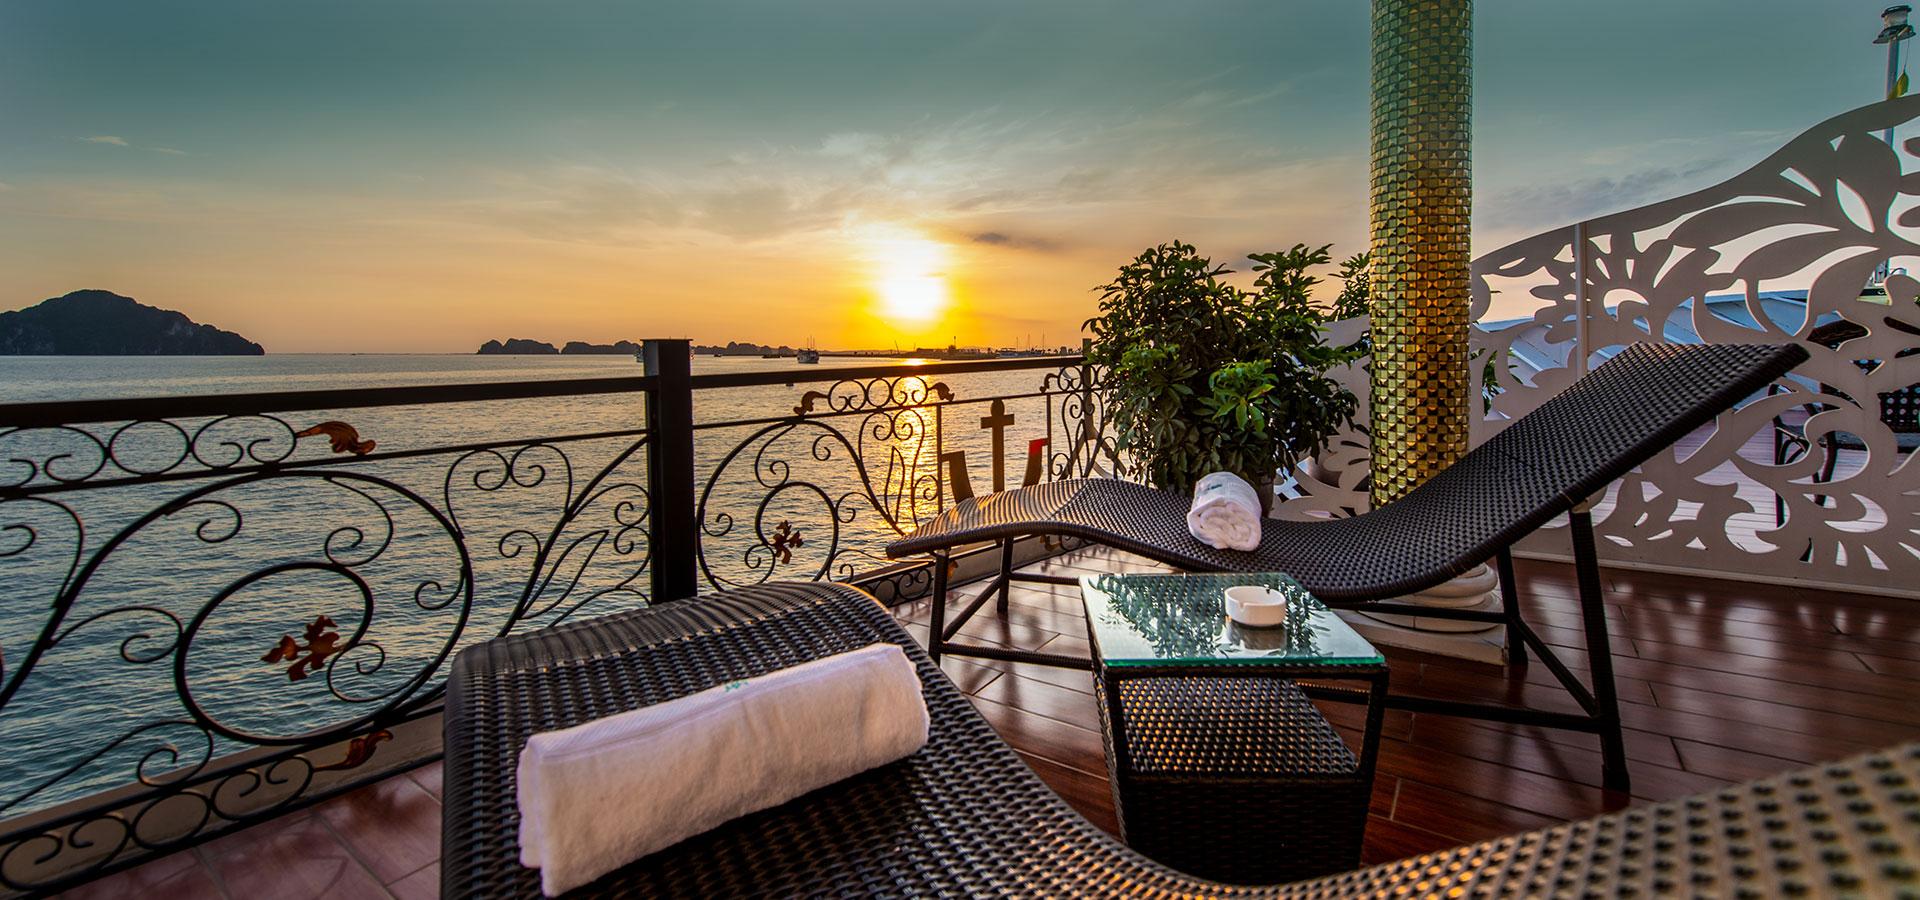 Halong bay cruise sunset